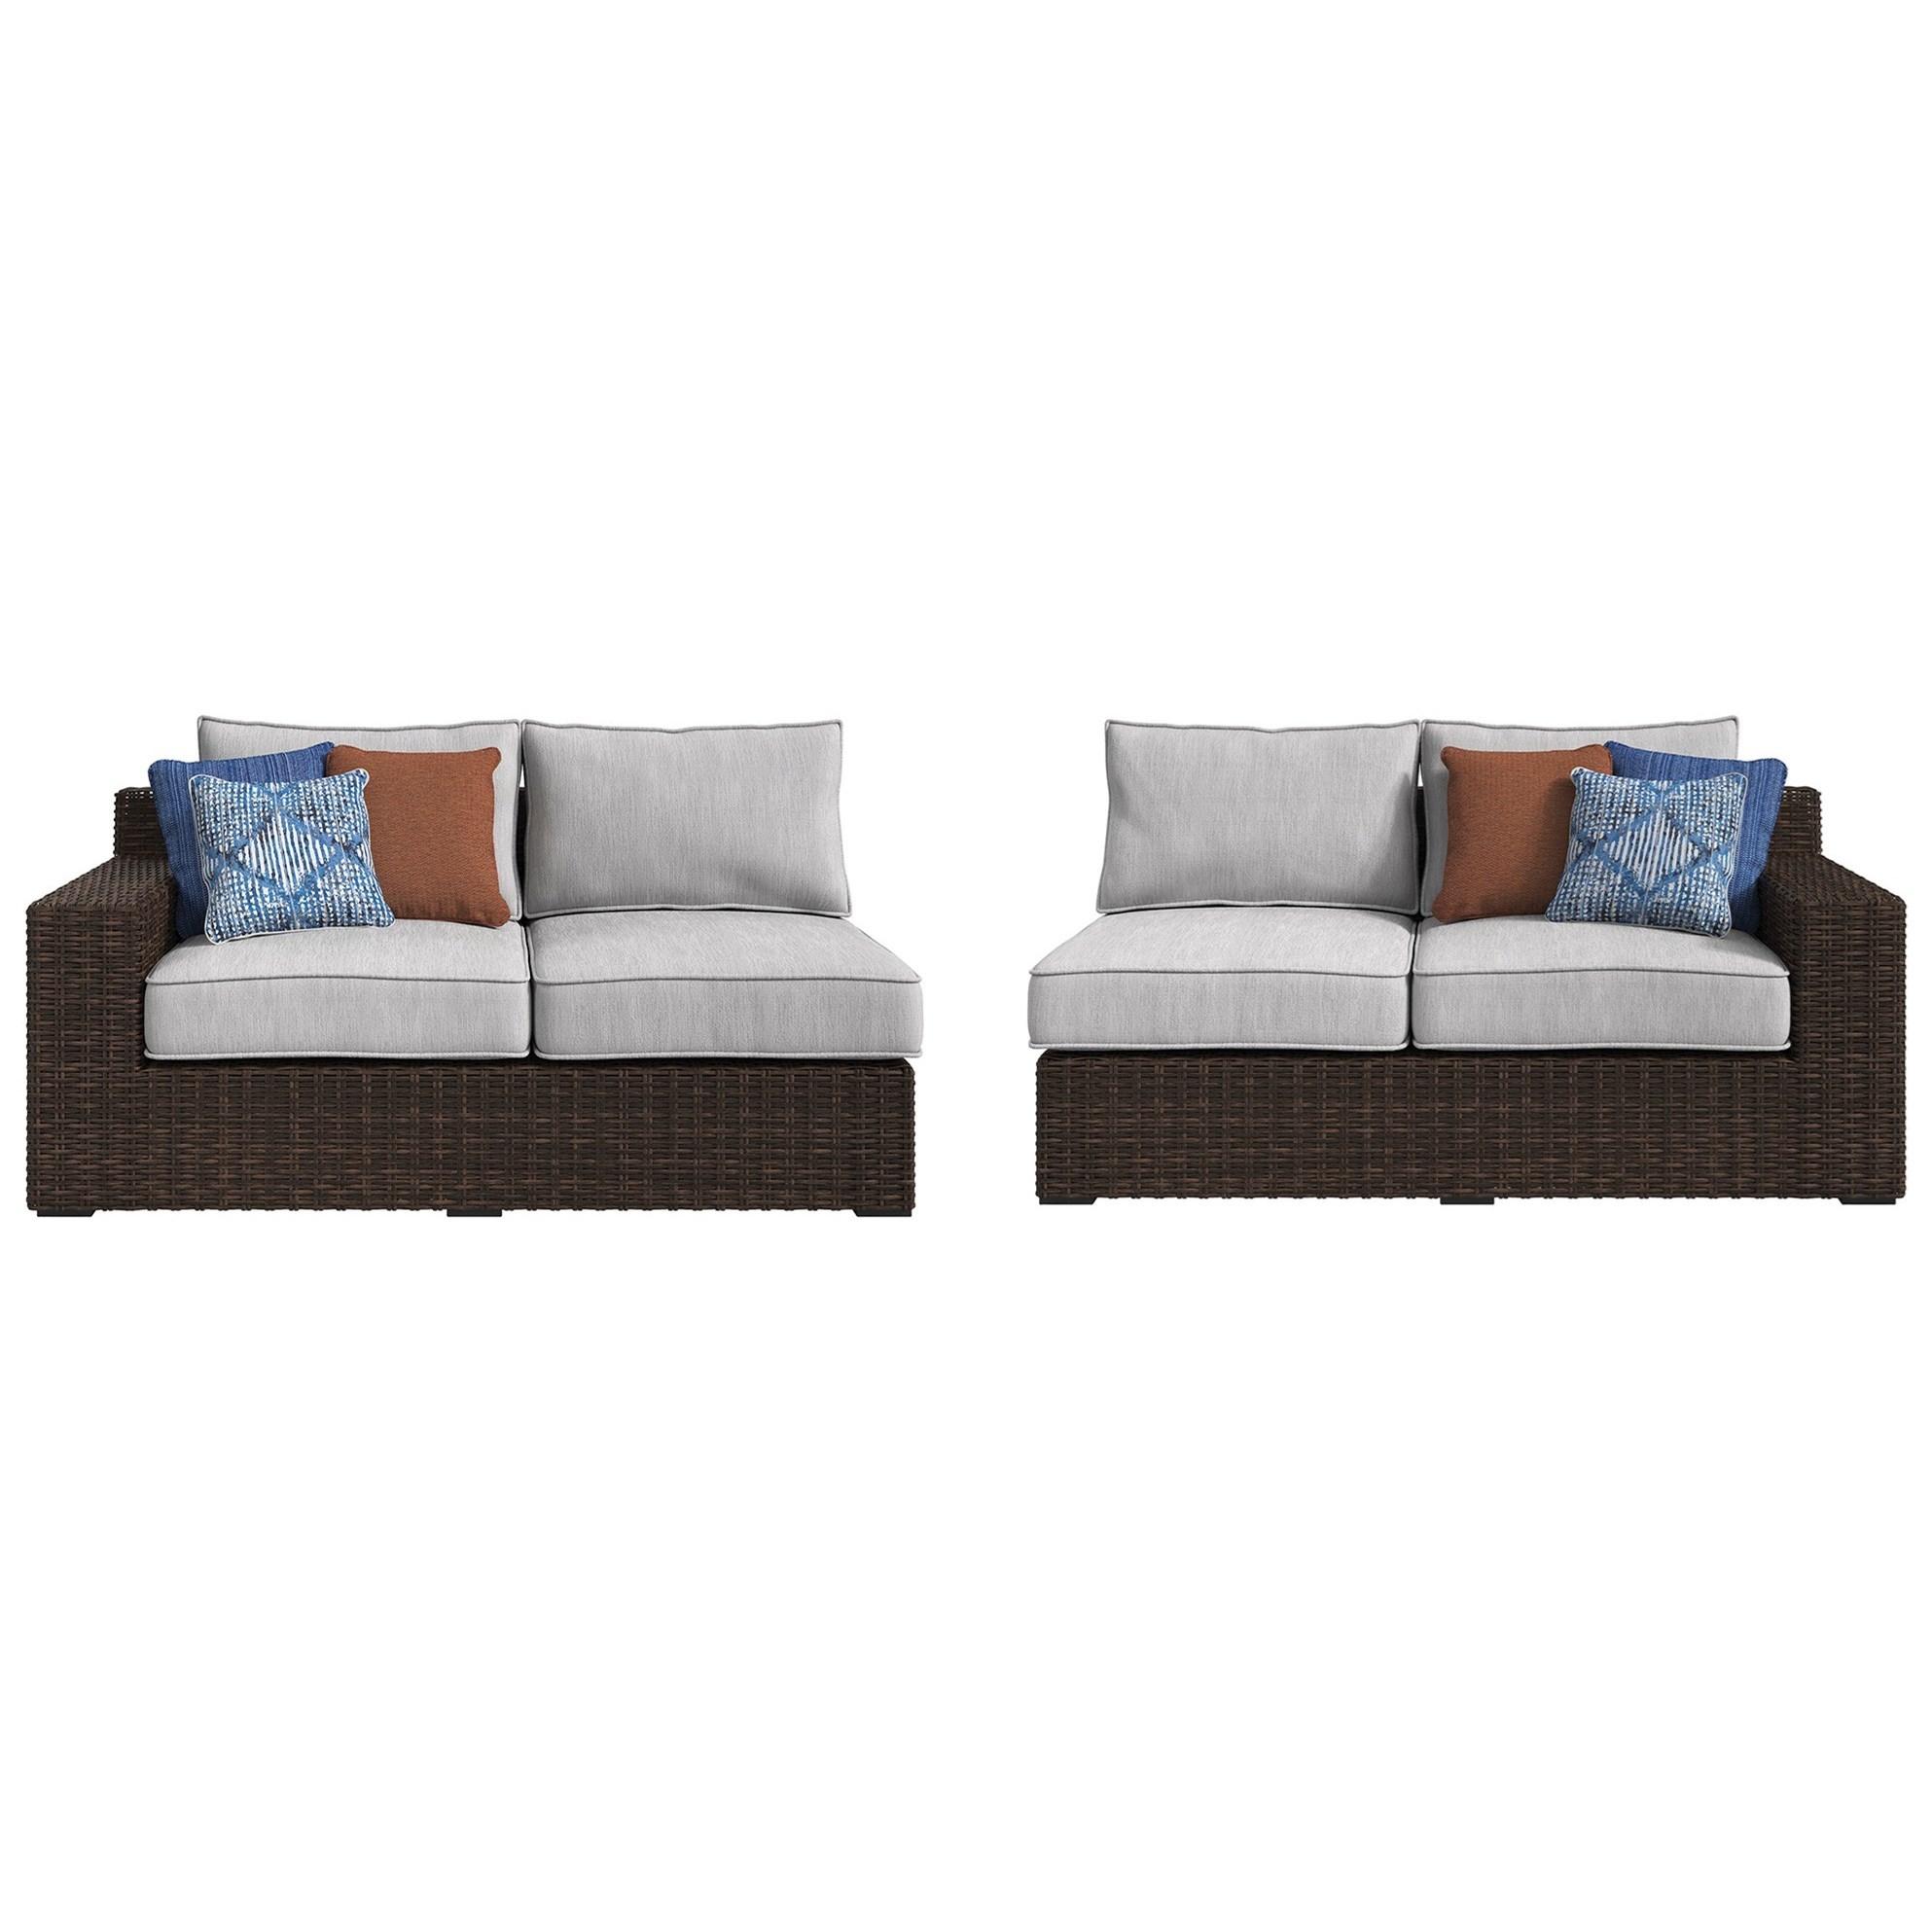 RAF Loveseat & LAF Loveseat with Cushion